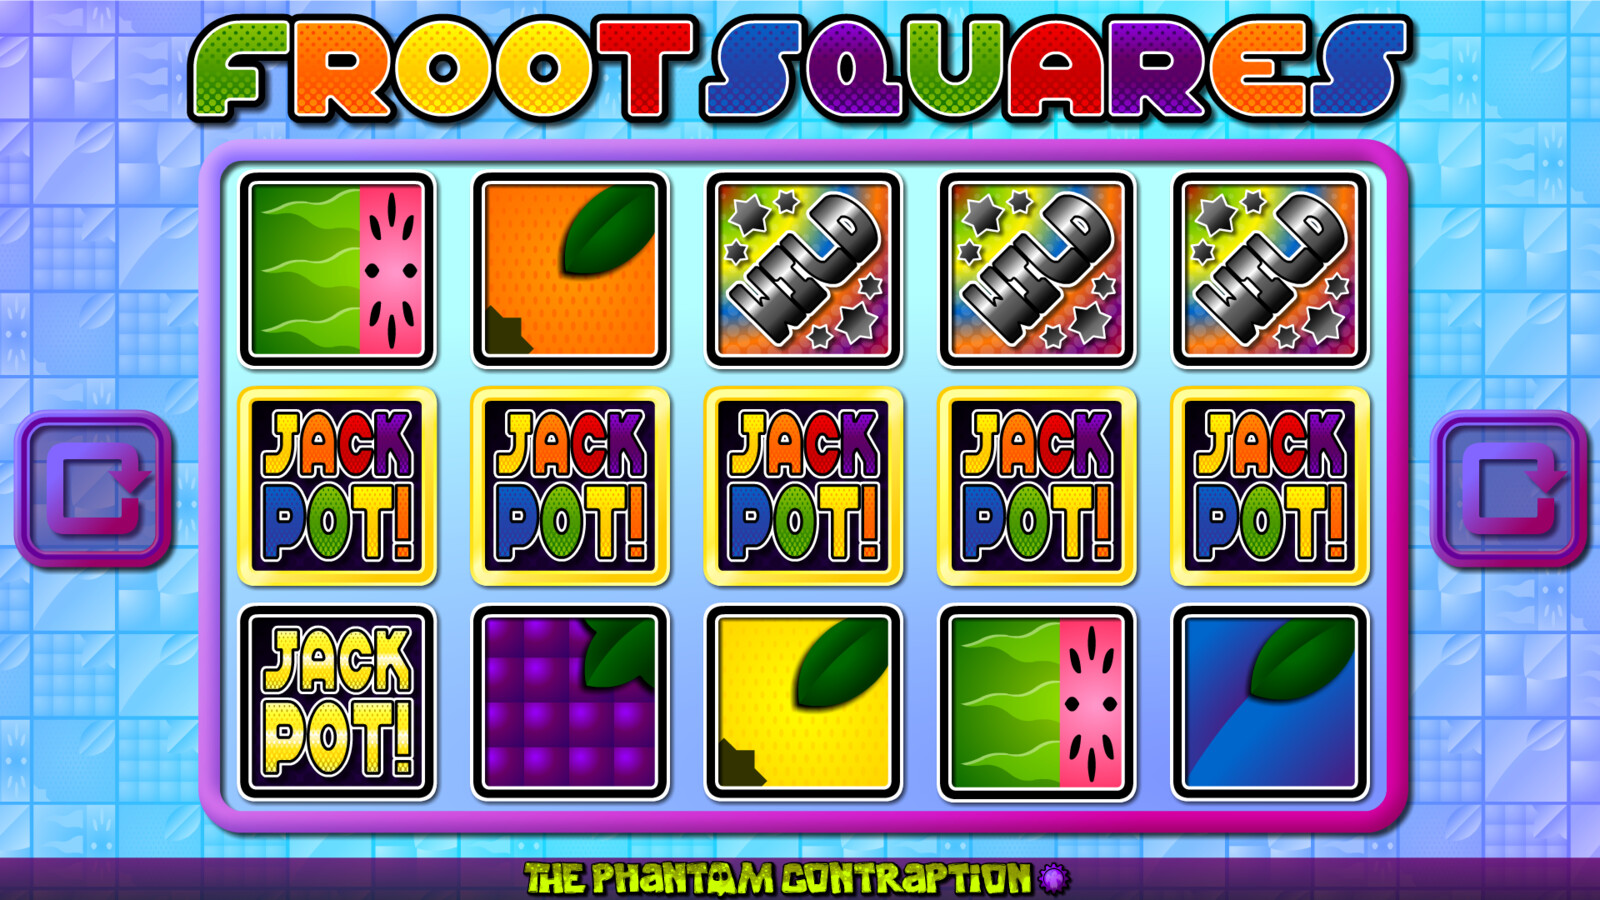 Froot Squares Landscape Screenshot: Jackpot Line